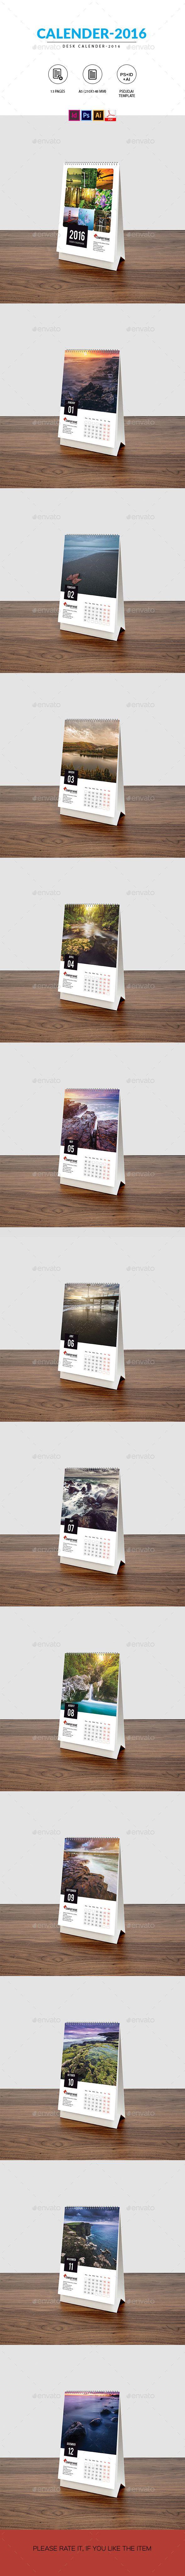 Desk Calendar 2016 Template #design Download: http://graphicriver.net/item/desk-calendar-2016/13502238?ref=ksioks